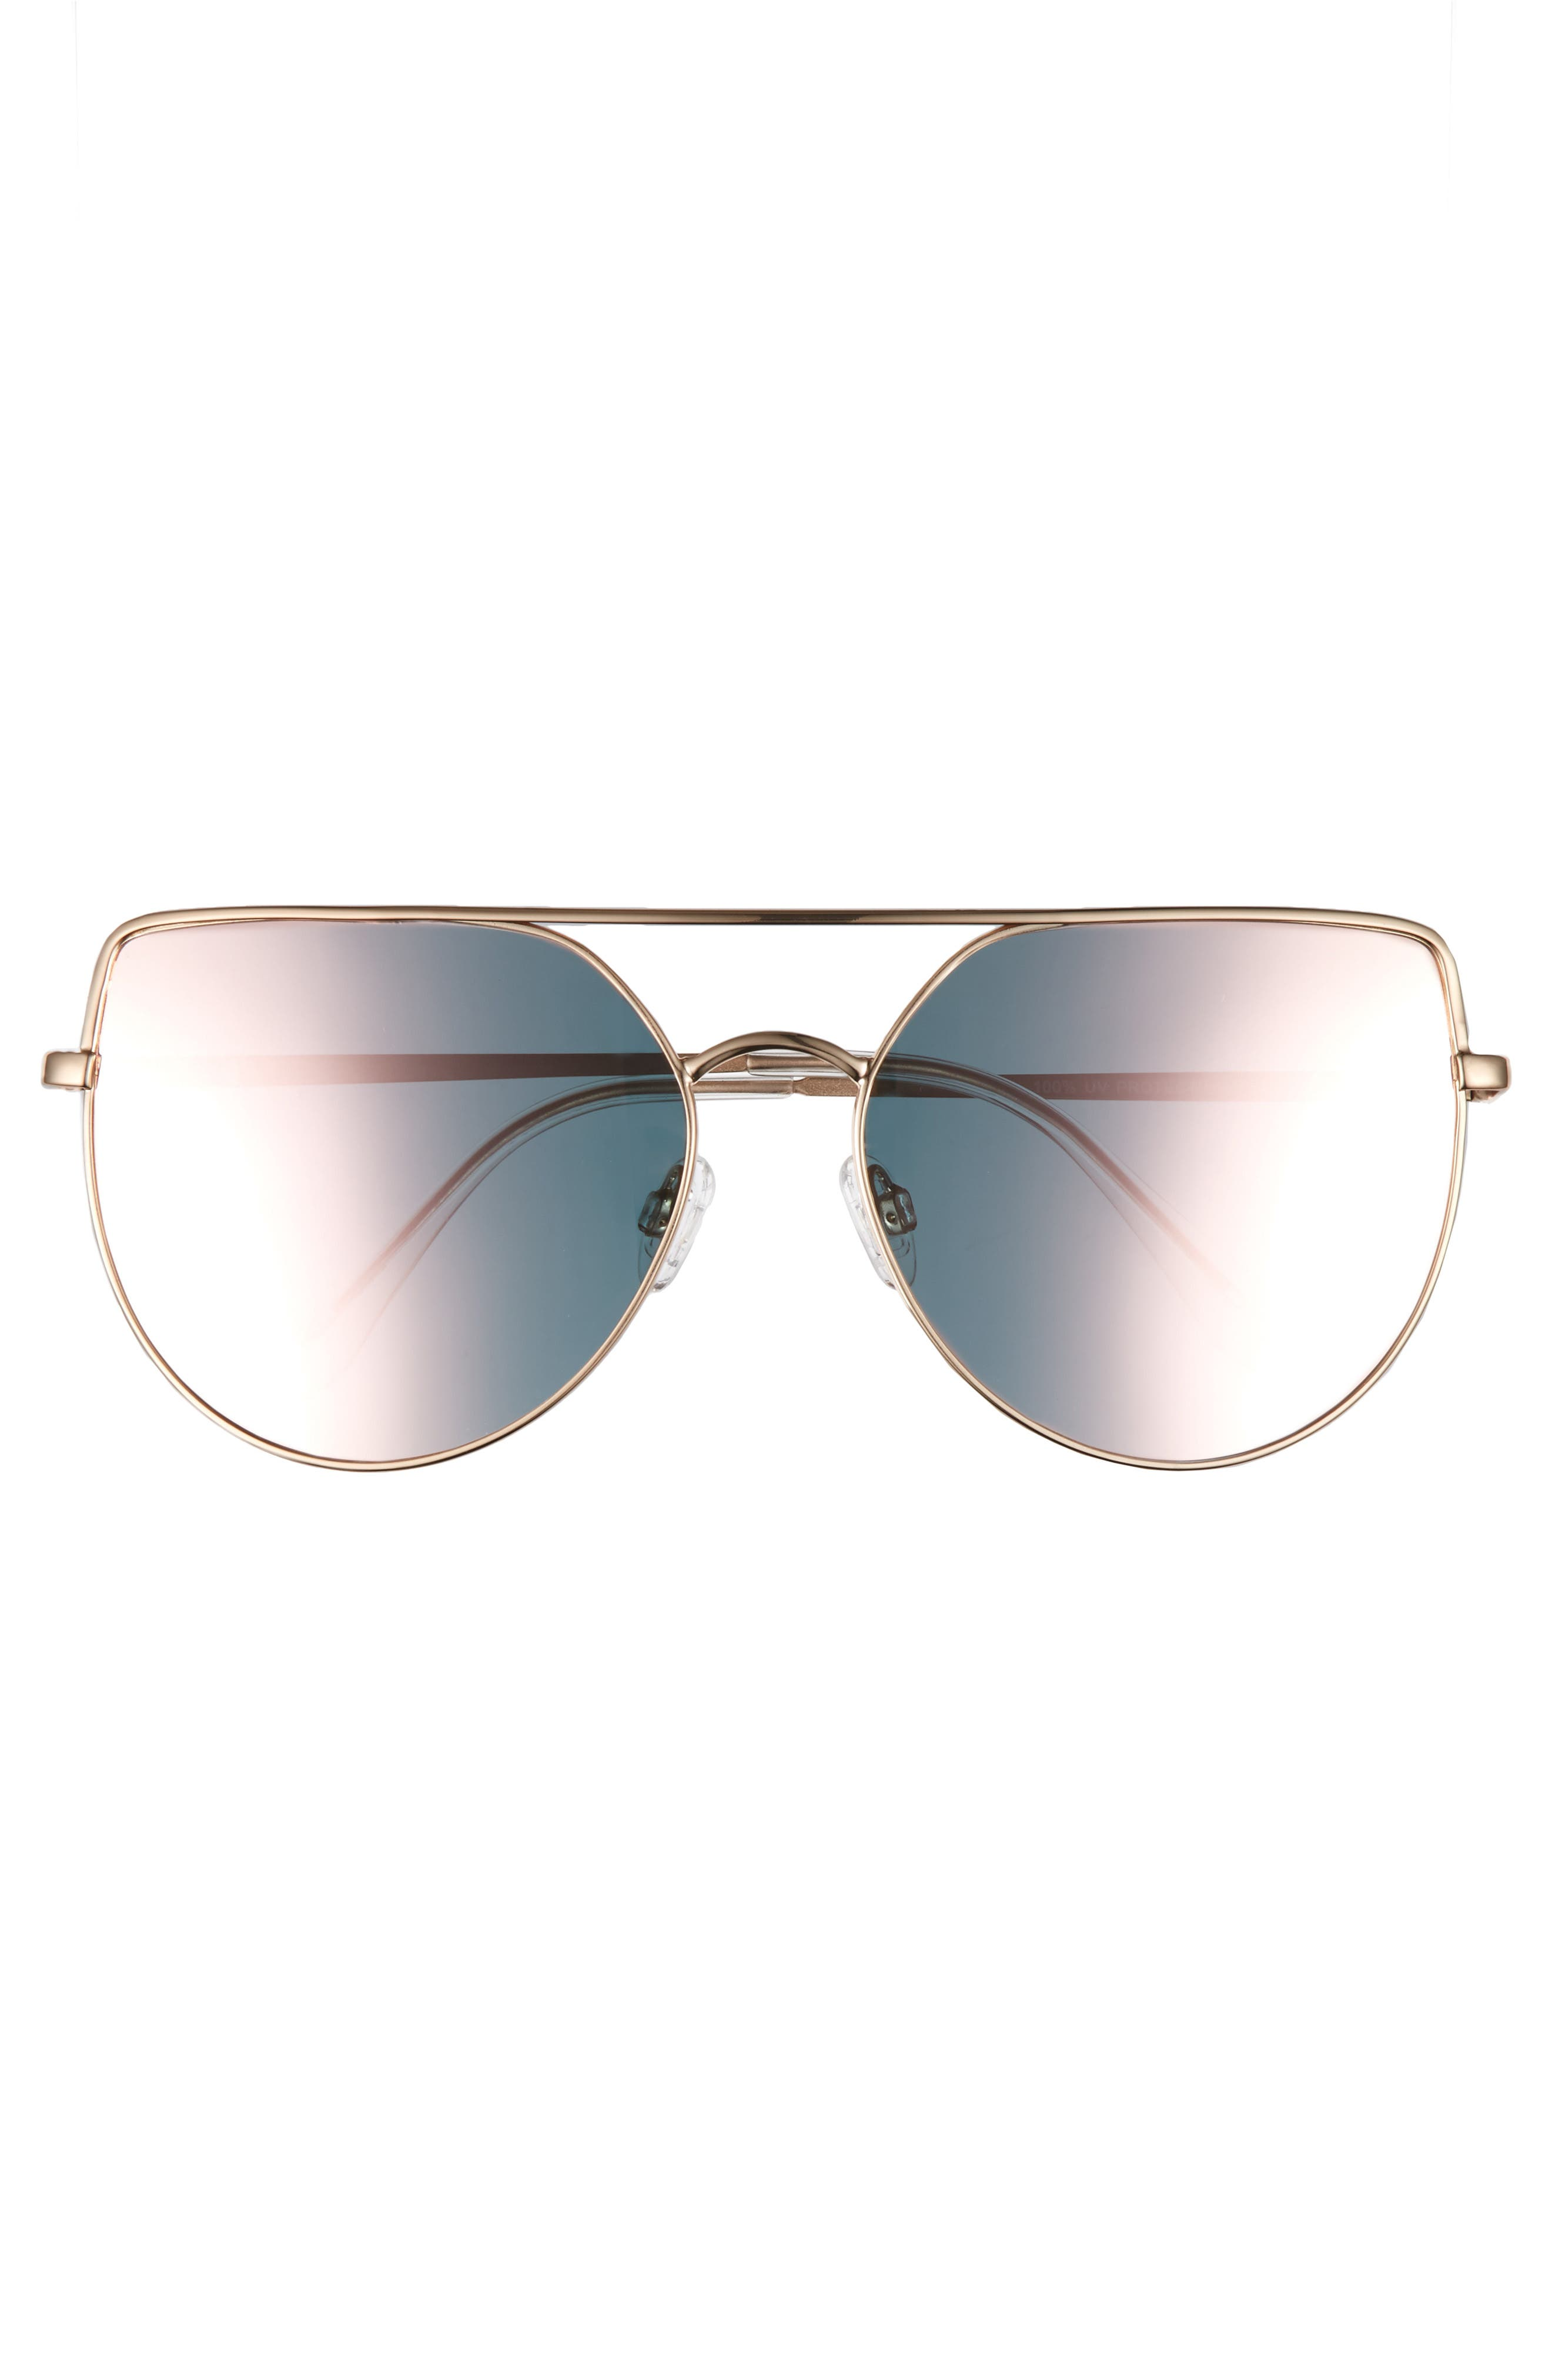 60mm Aviator Sunglasses,                             Alternate thumbnail 6, color,